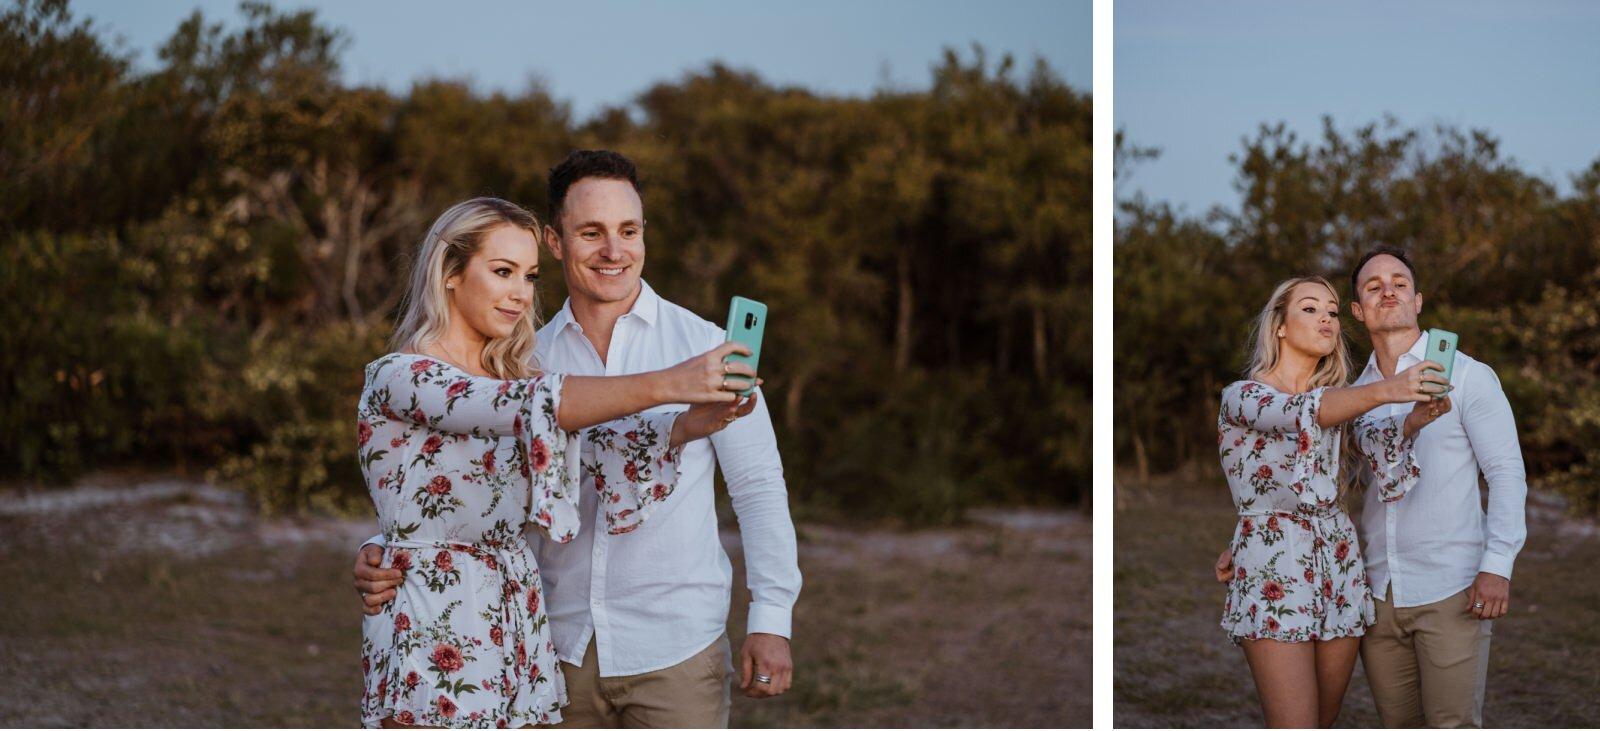 newcastle-wedding-photographer-dudley-engagement-shoot-37.jpg